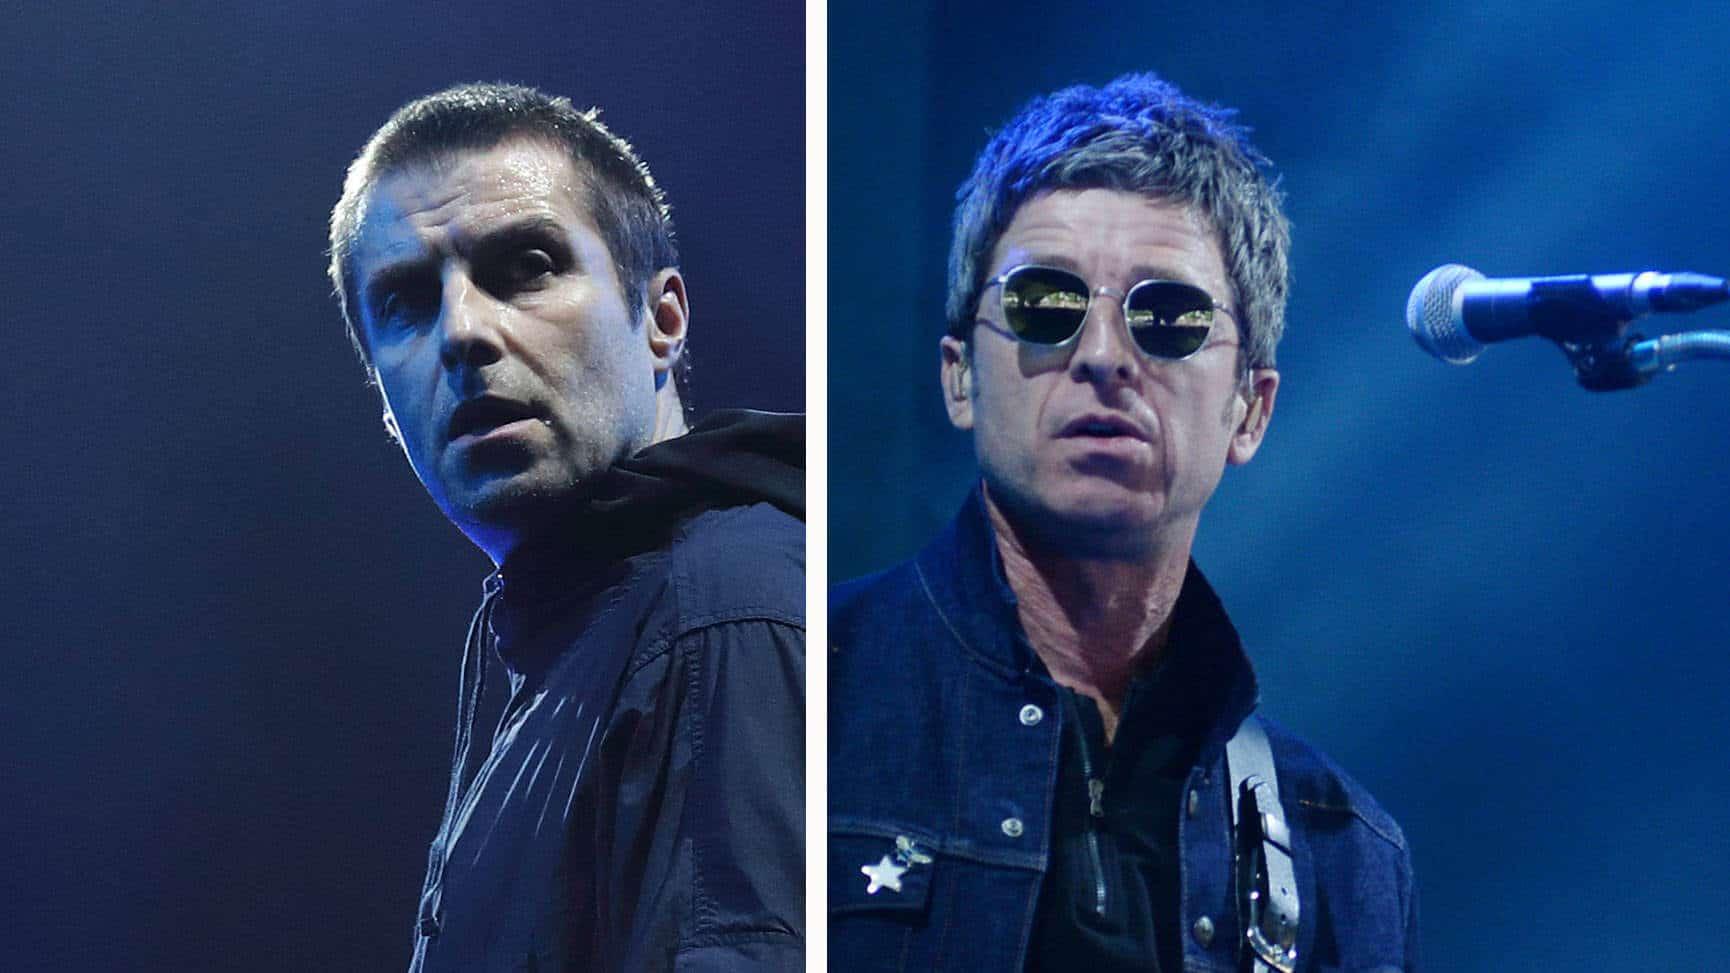 Liam Gallagher podrá reunir a Oasis en 2021?